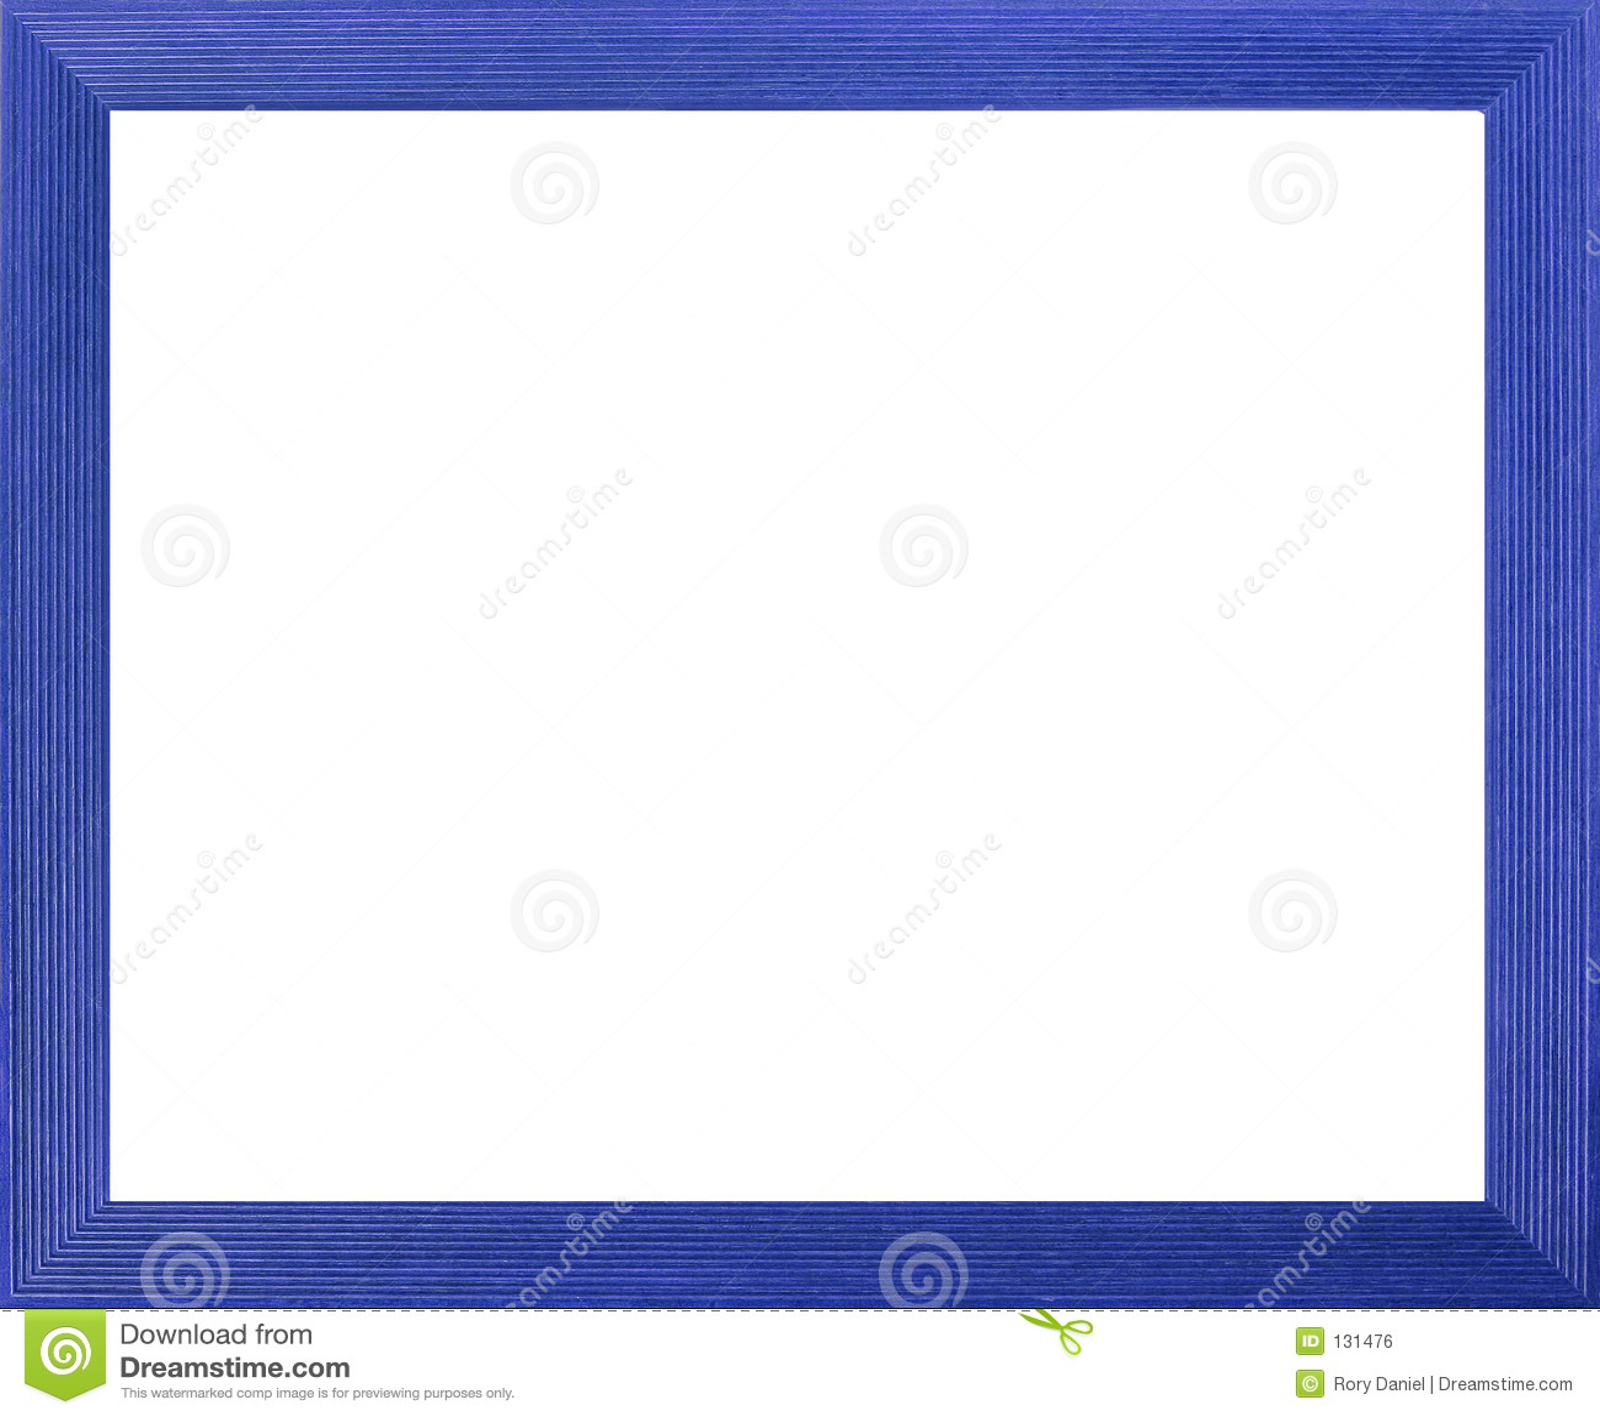 Excepcional Marcos De Cuadros Azules Elaboración - Ideas ...